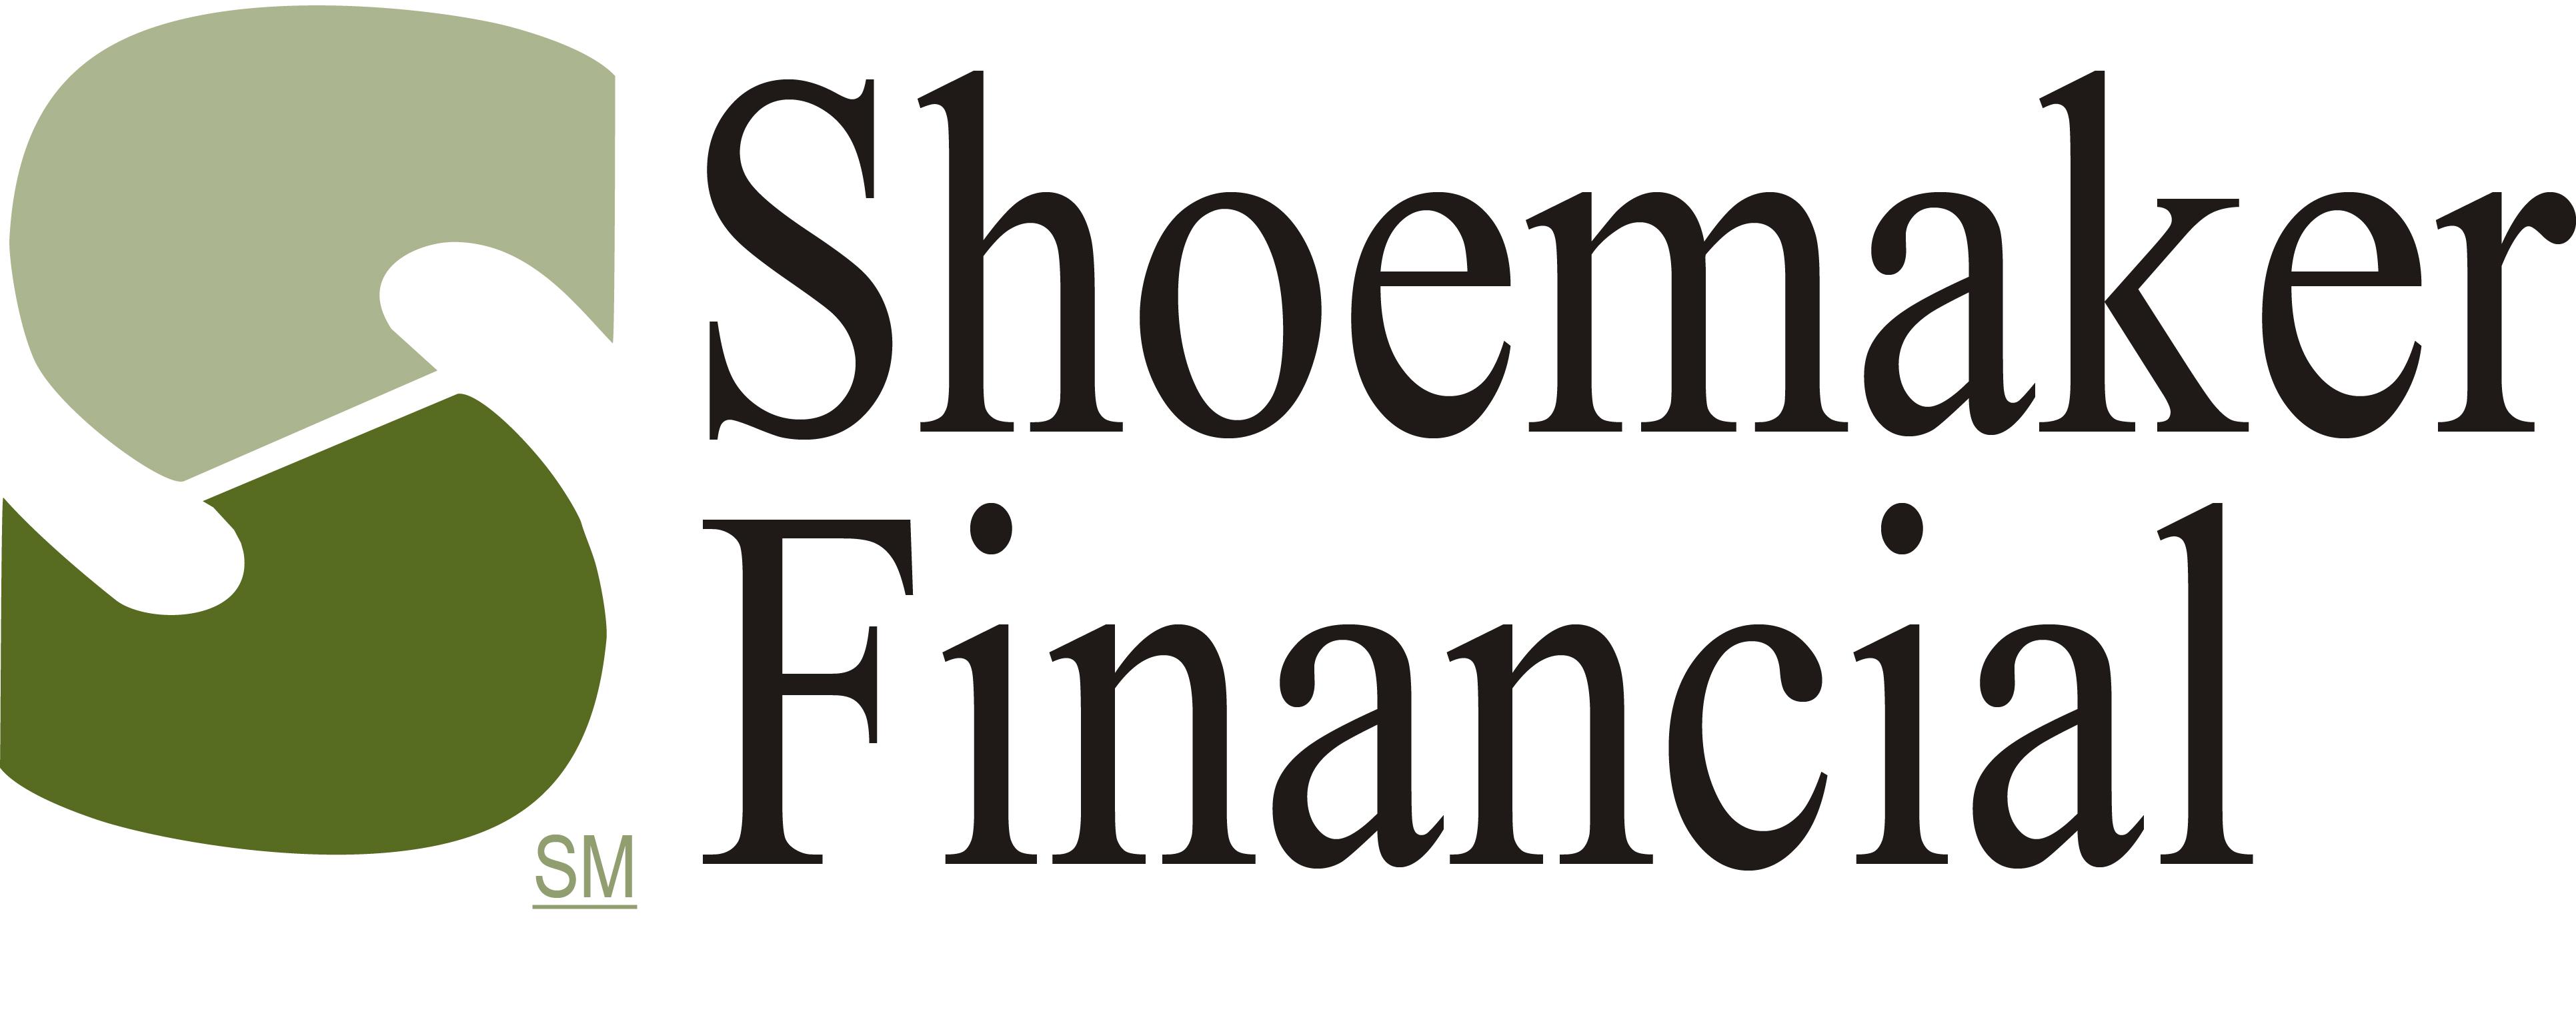 Shoemaker Financial logo